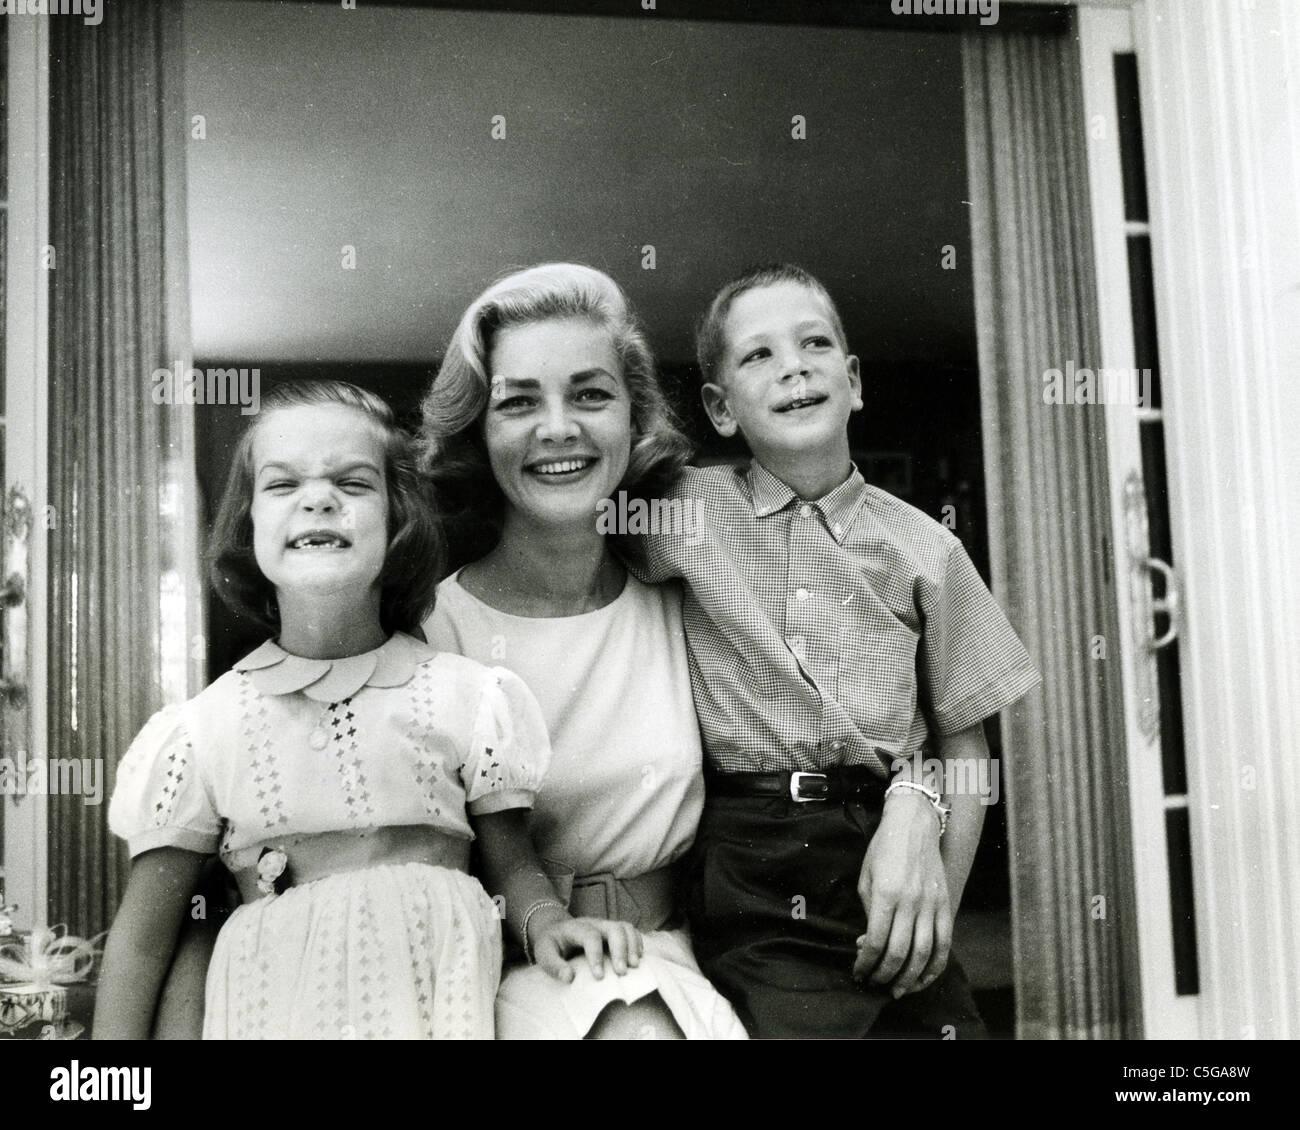 LAUREN BACALL about 1955 with her children by Humphrey ... Lauren Bacall Children